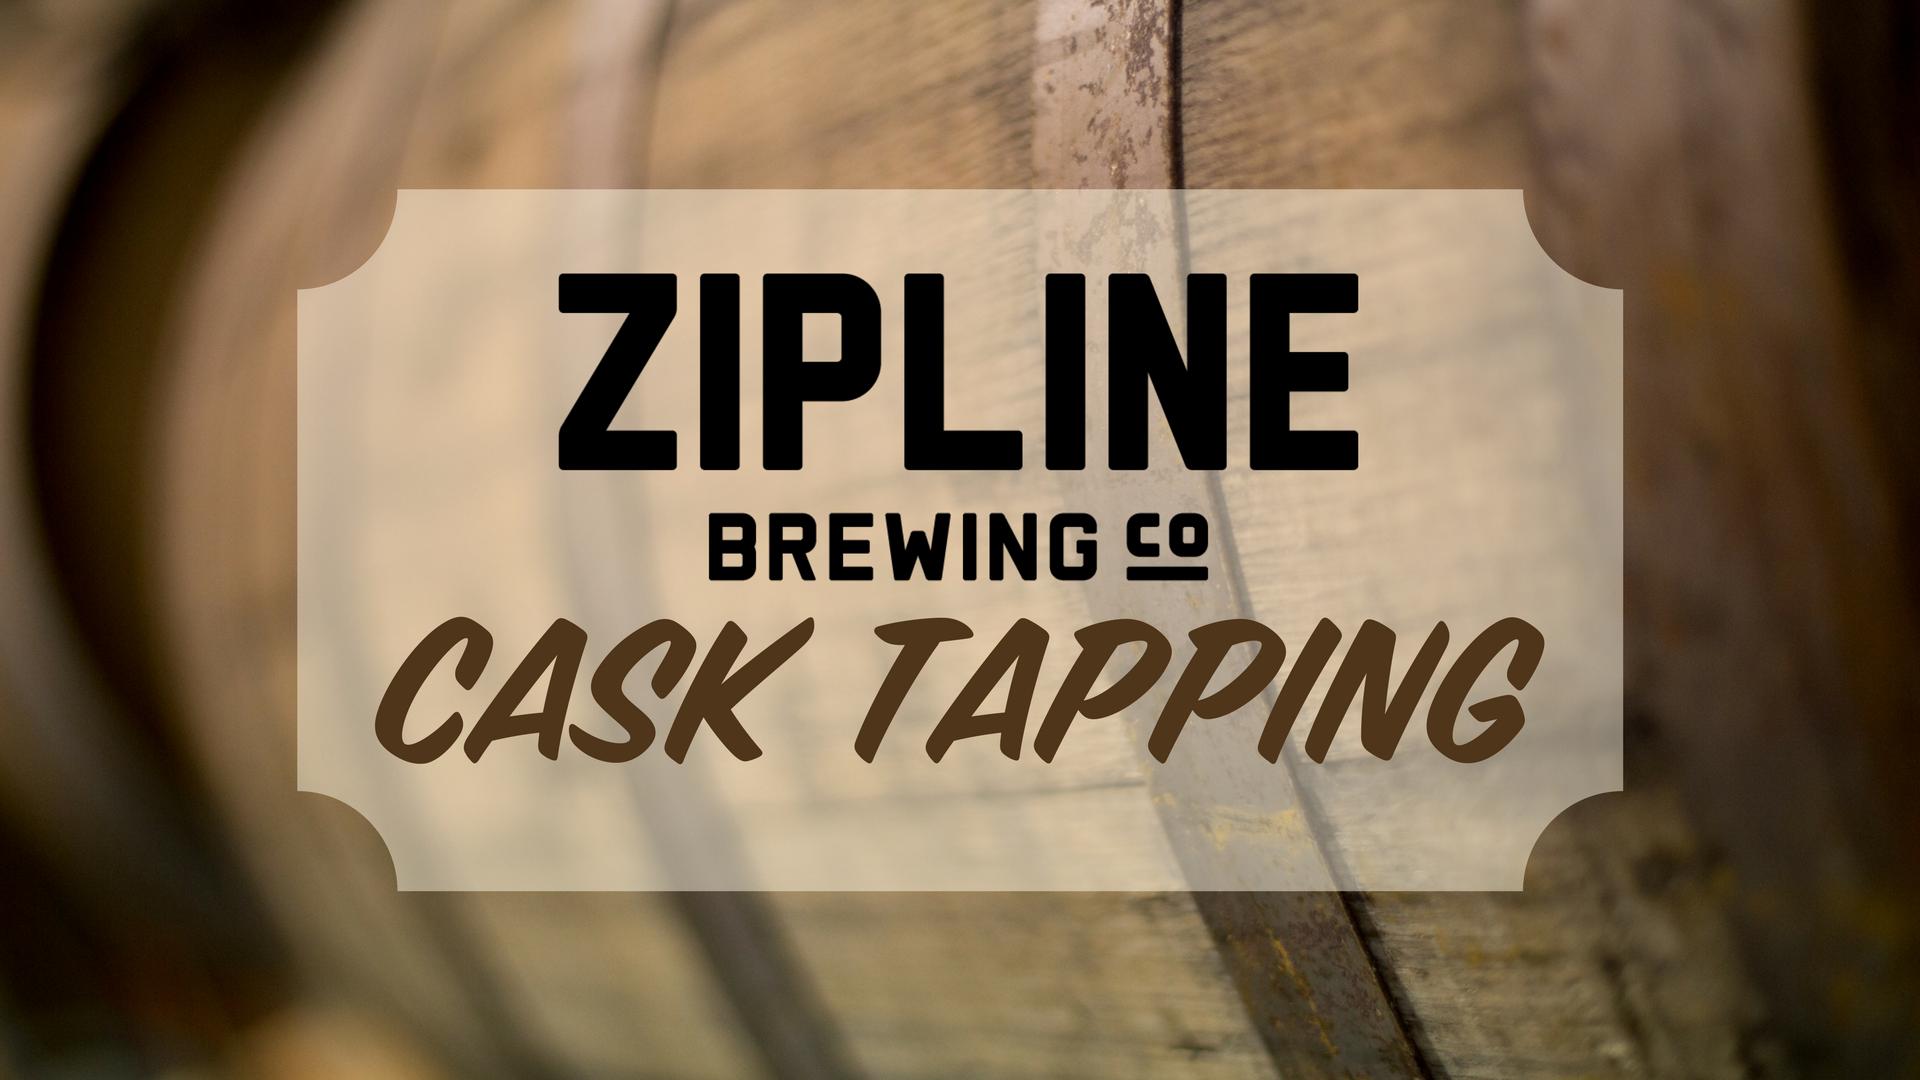 Zipline Brewery Taproom Cask Tapping Zipline Brewing Co